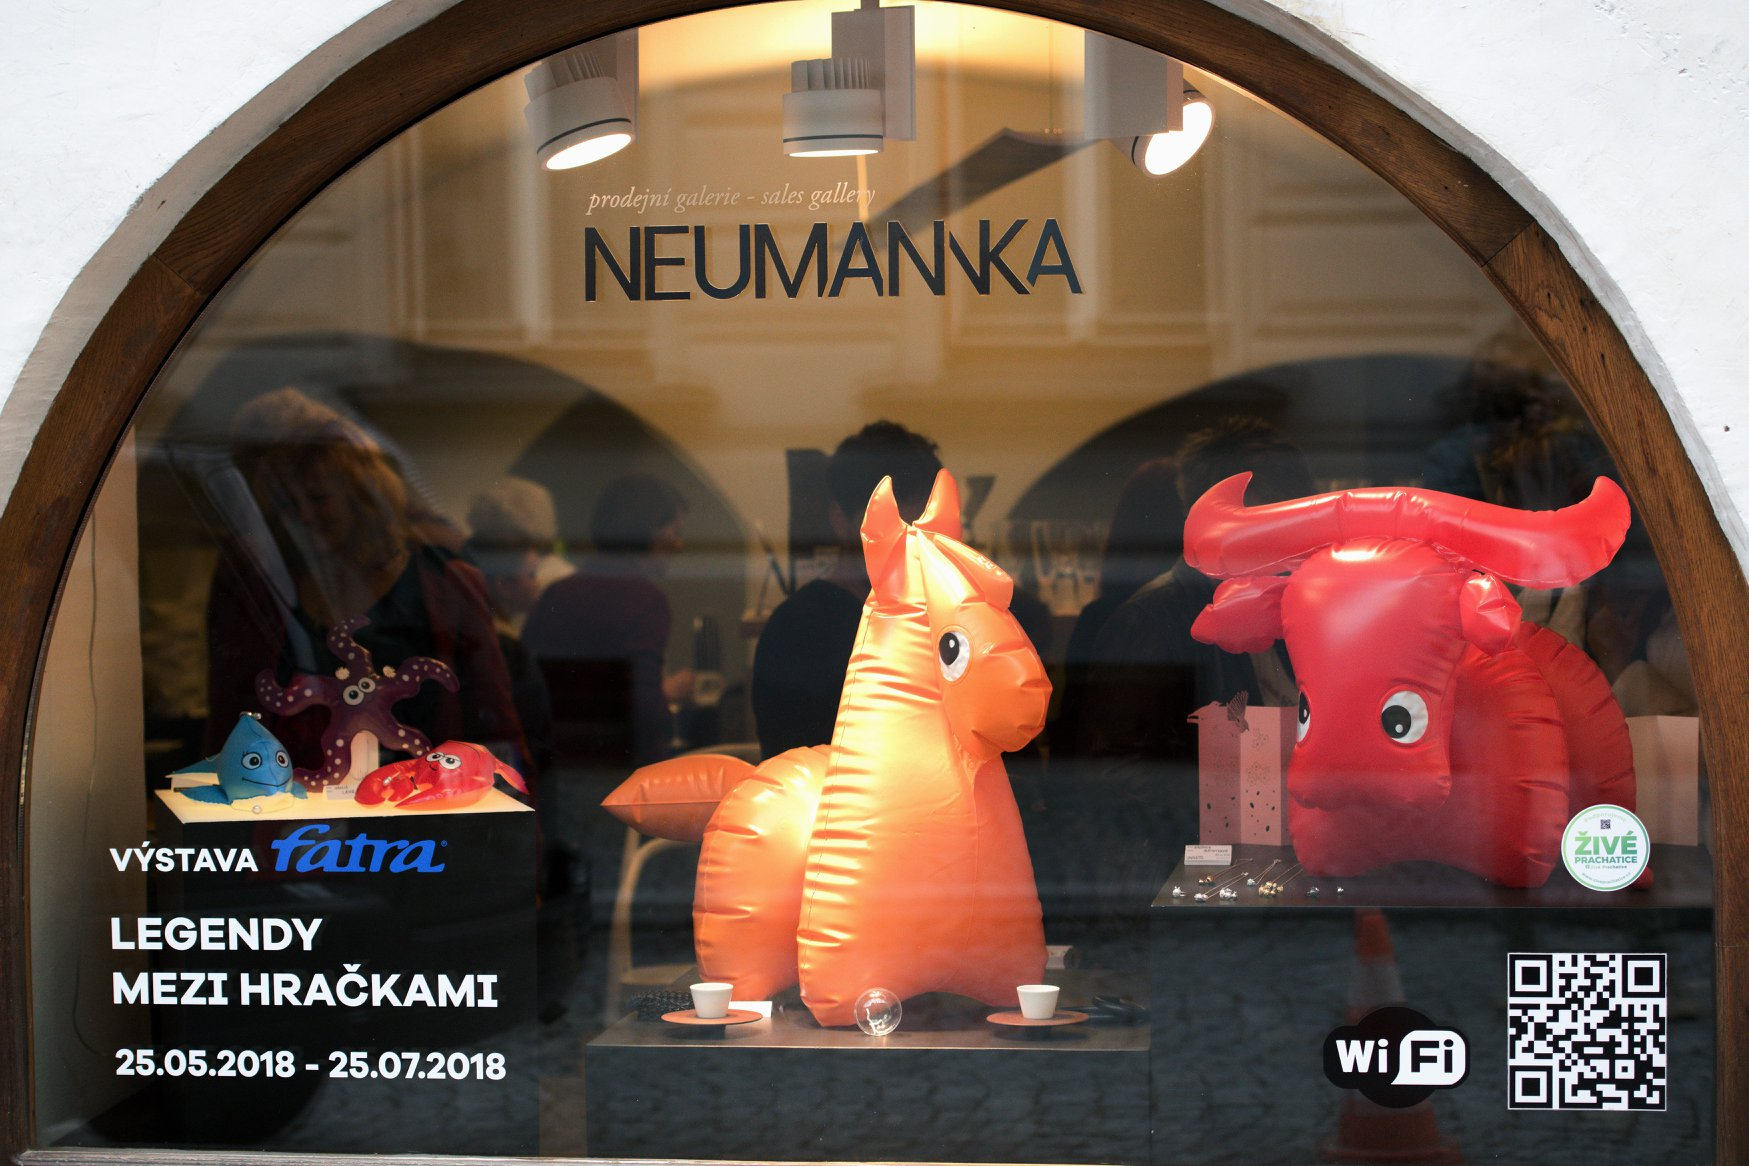 Výstava NEUMANNKA